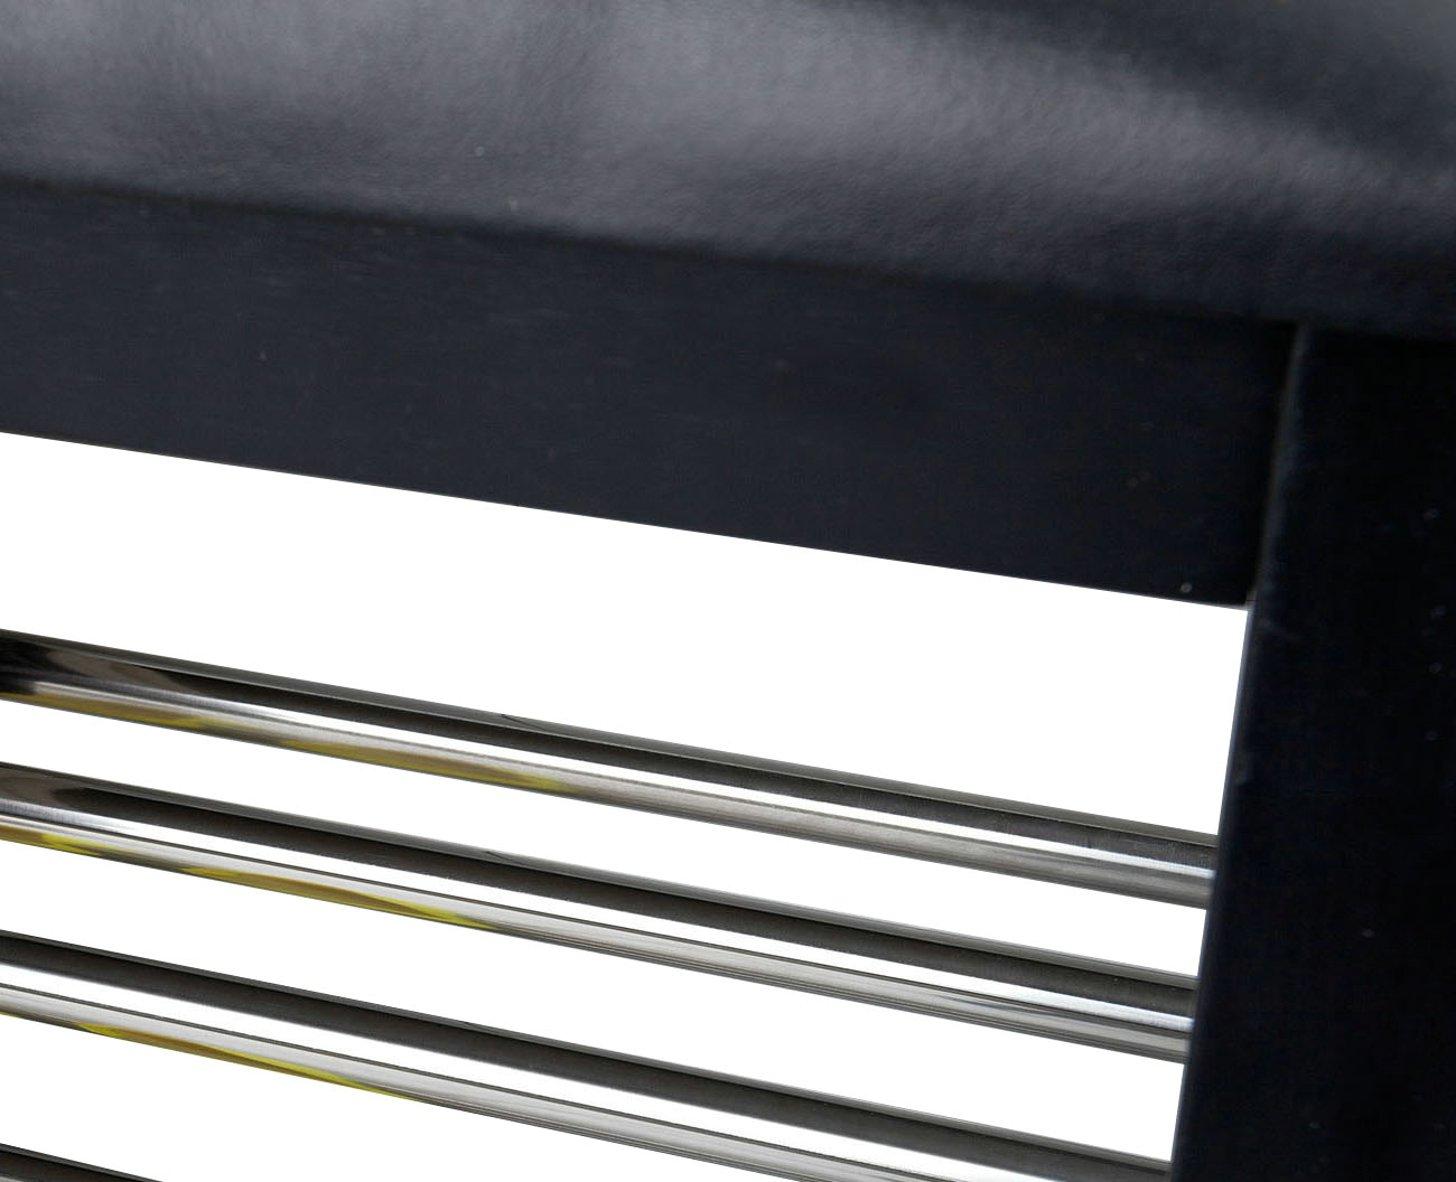 Nero Orolay Scarpiera con Cuscino Panchina Ingresso Portascarpe